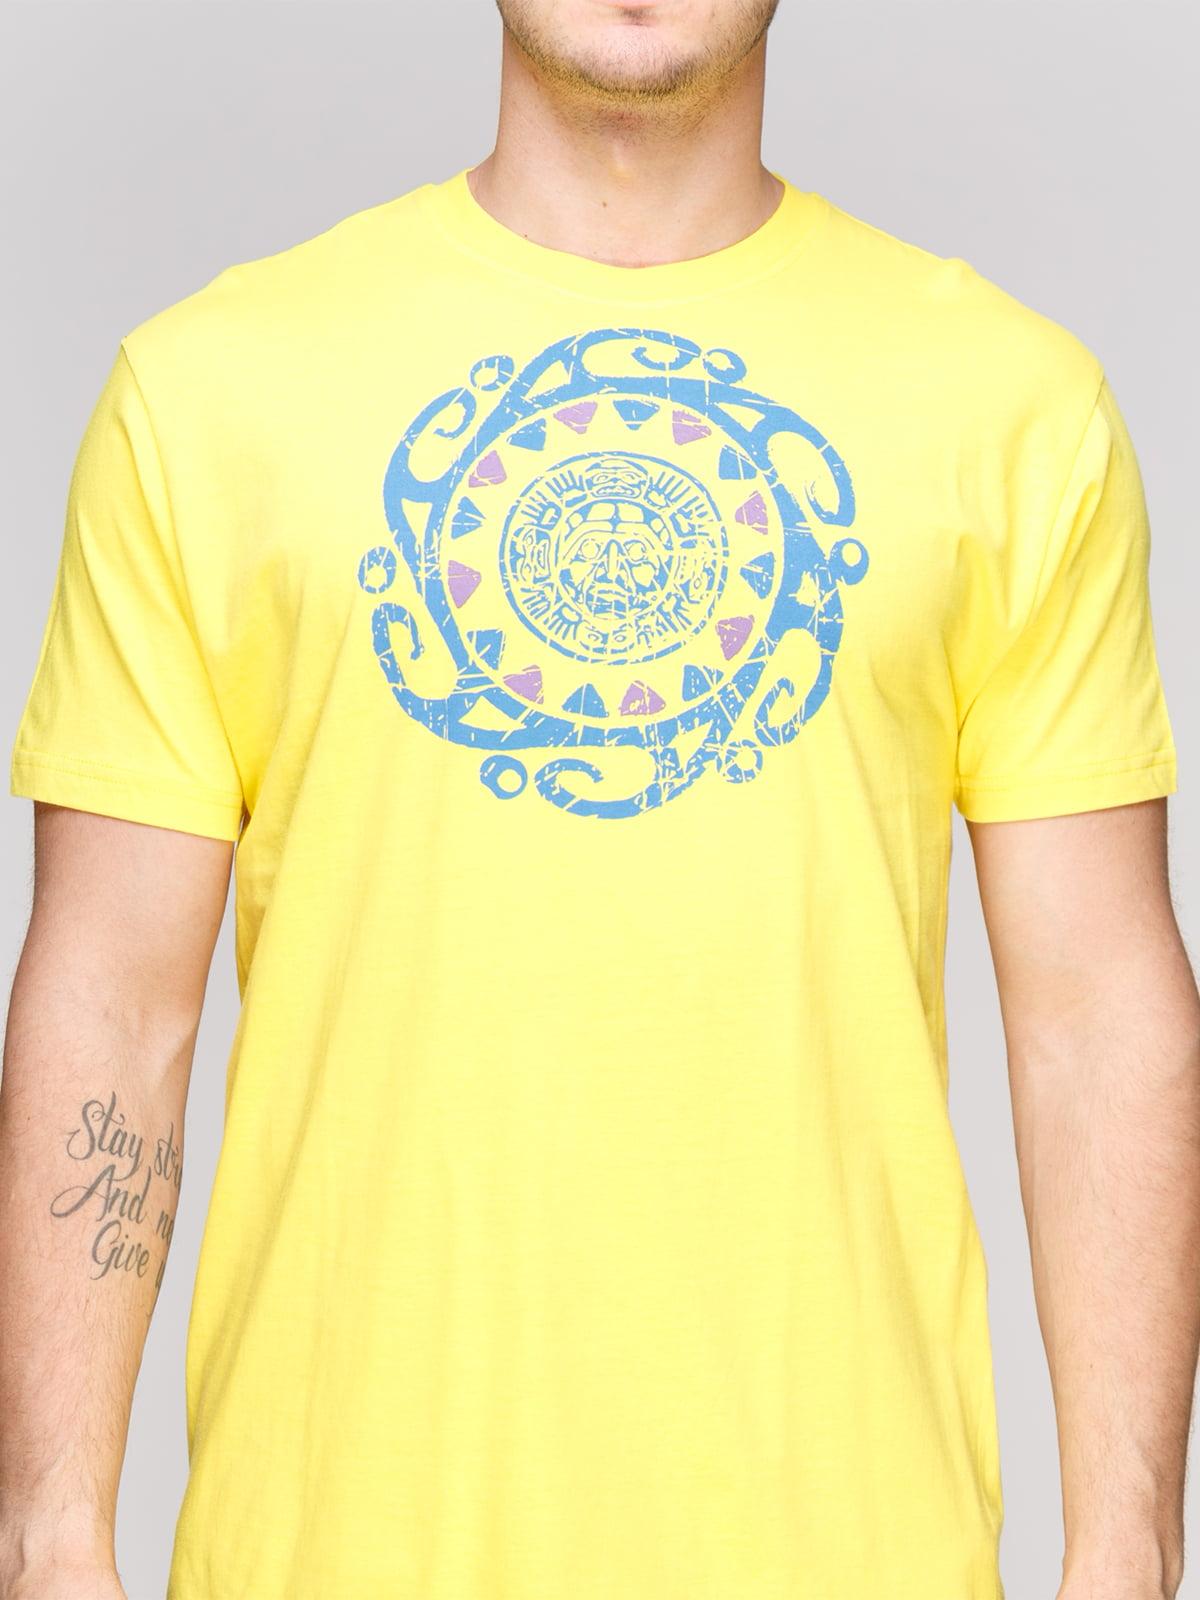 Футболка жовта з принтом | 4854956 | фото 3